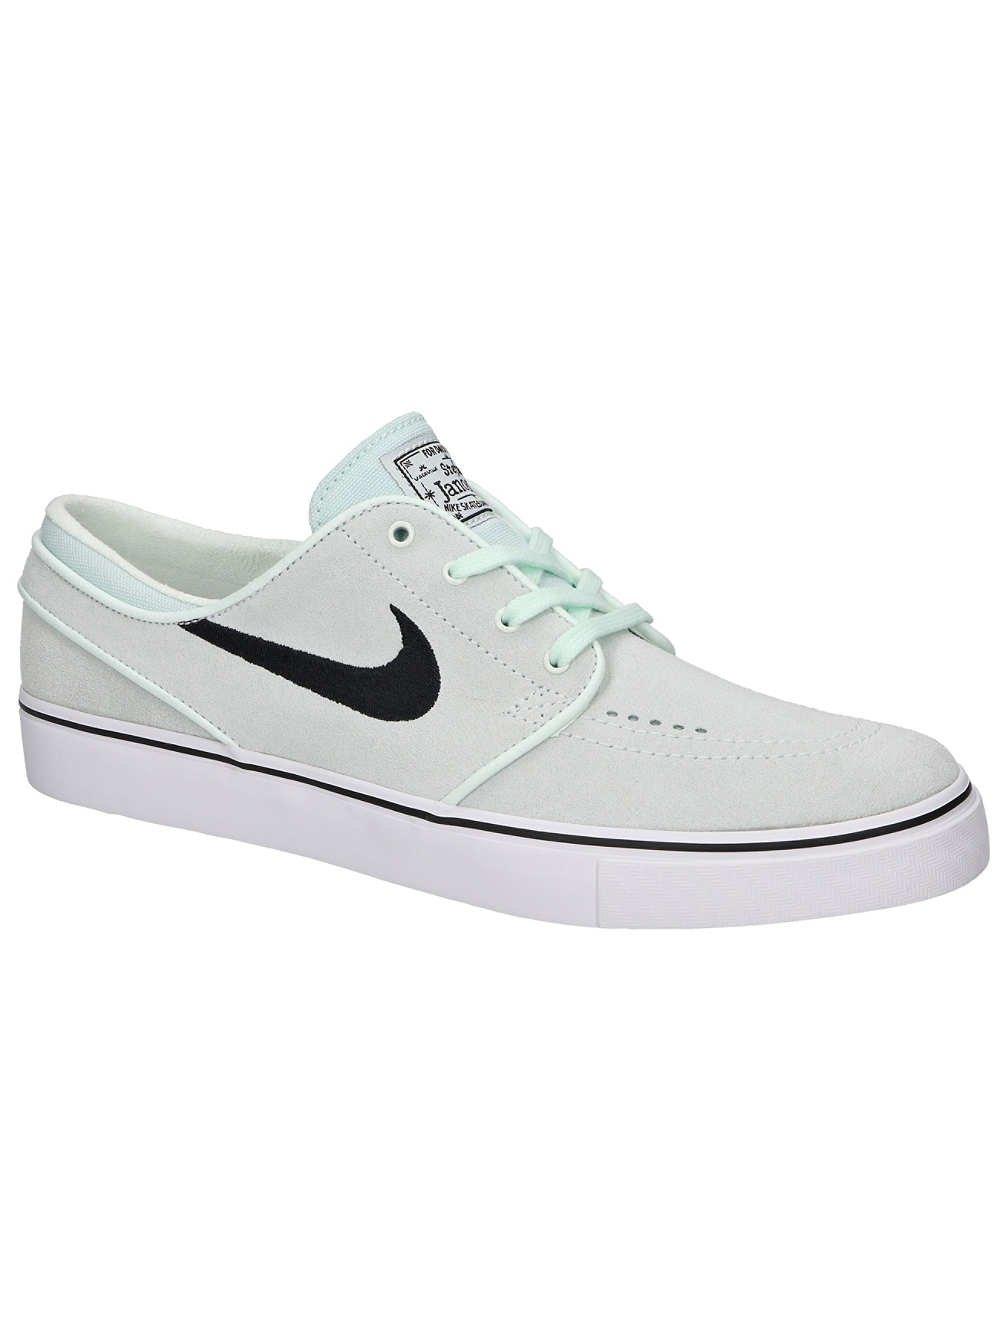 NIKE Men's Zoom Stefan Janoski Skate Shoe B0742Y5GHS 6 D(M) US|Barely Green/Black